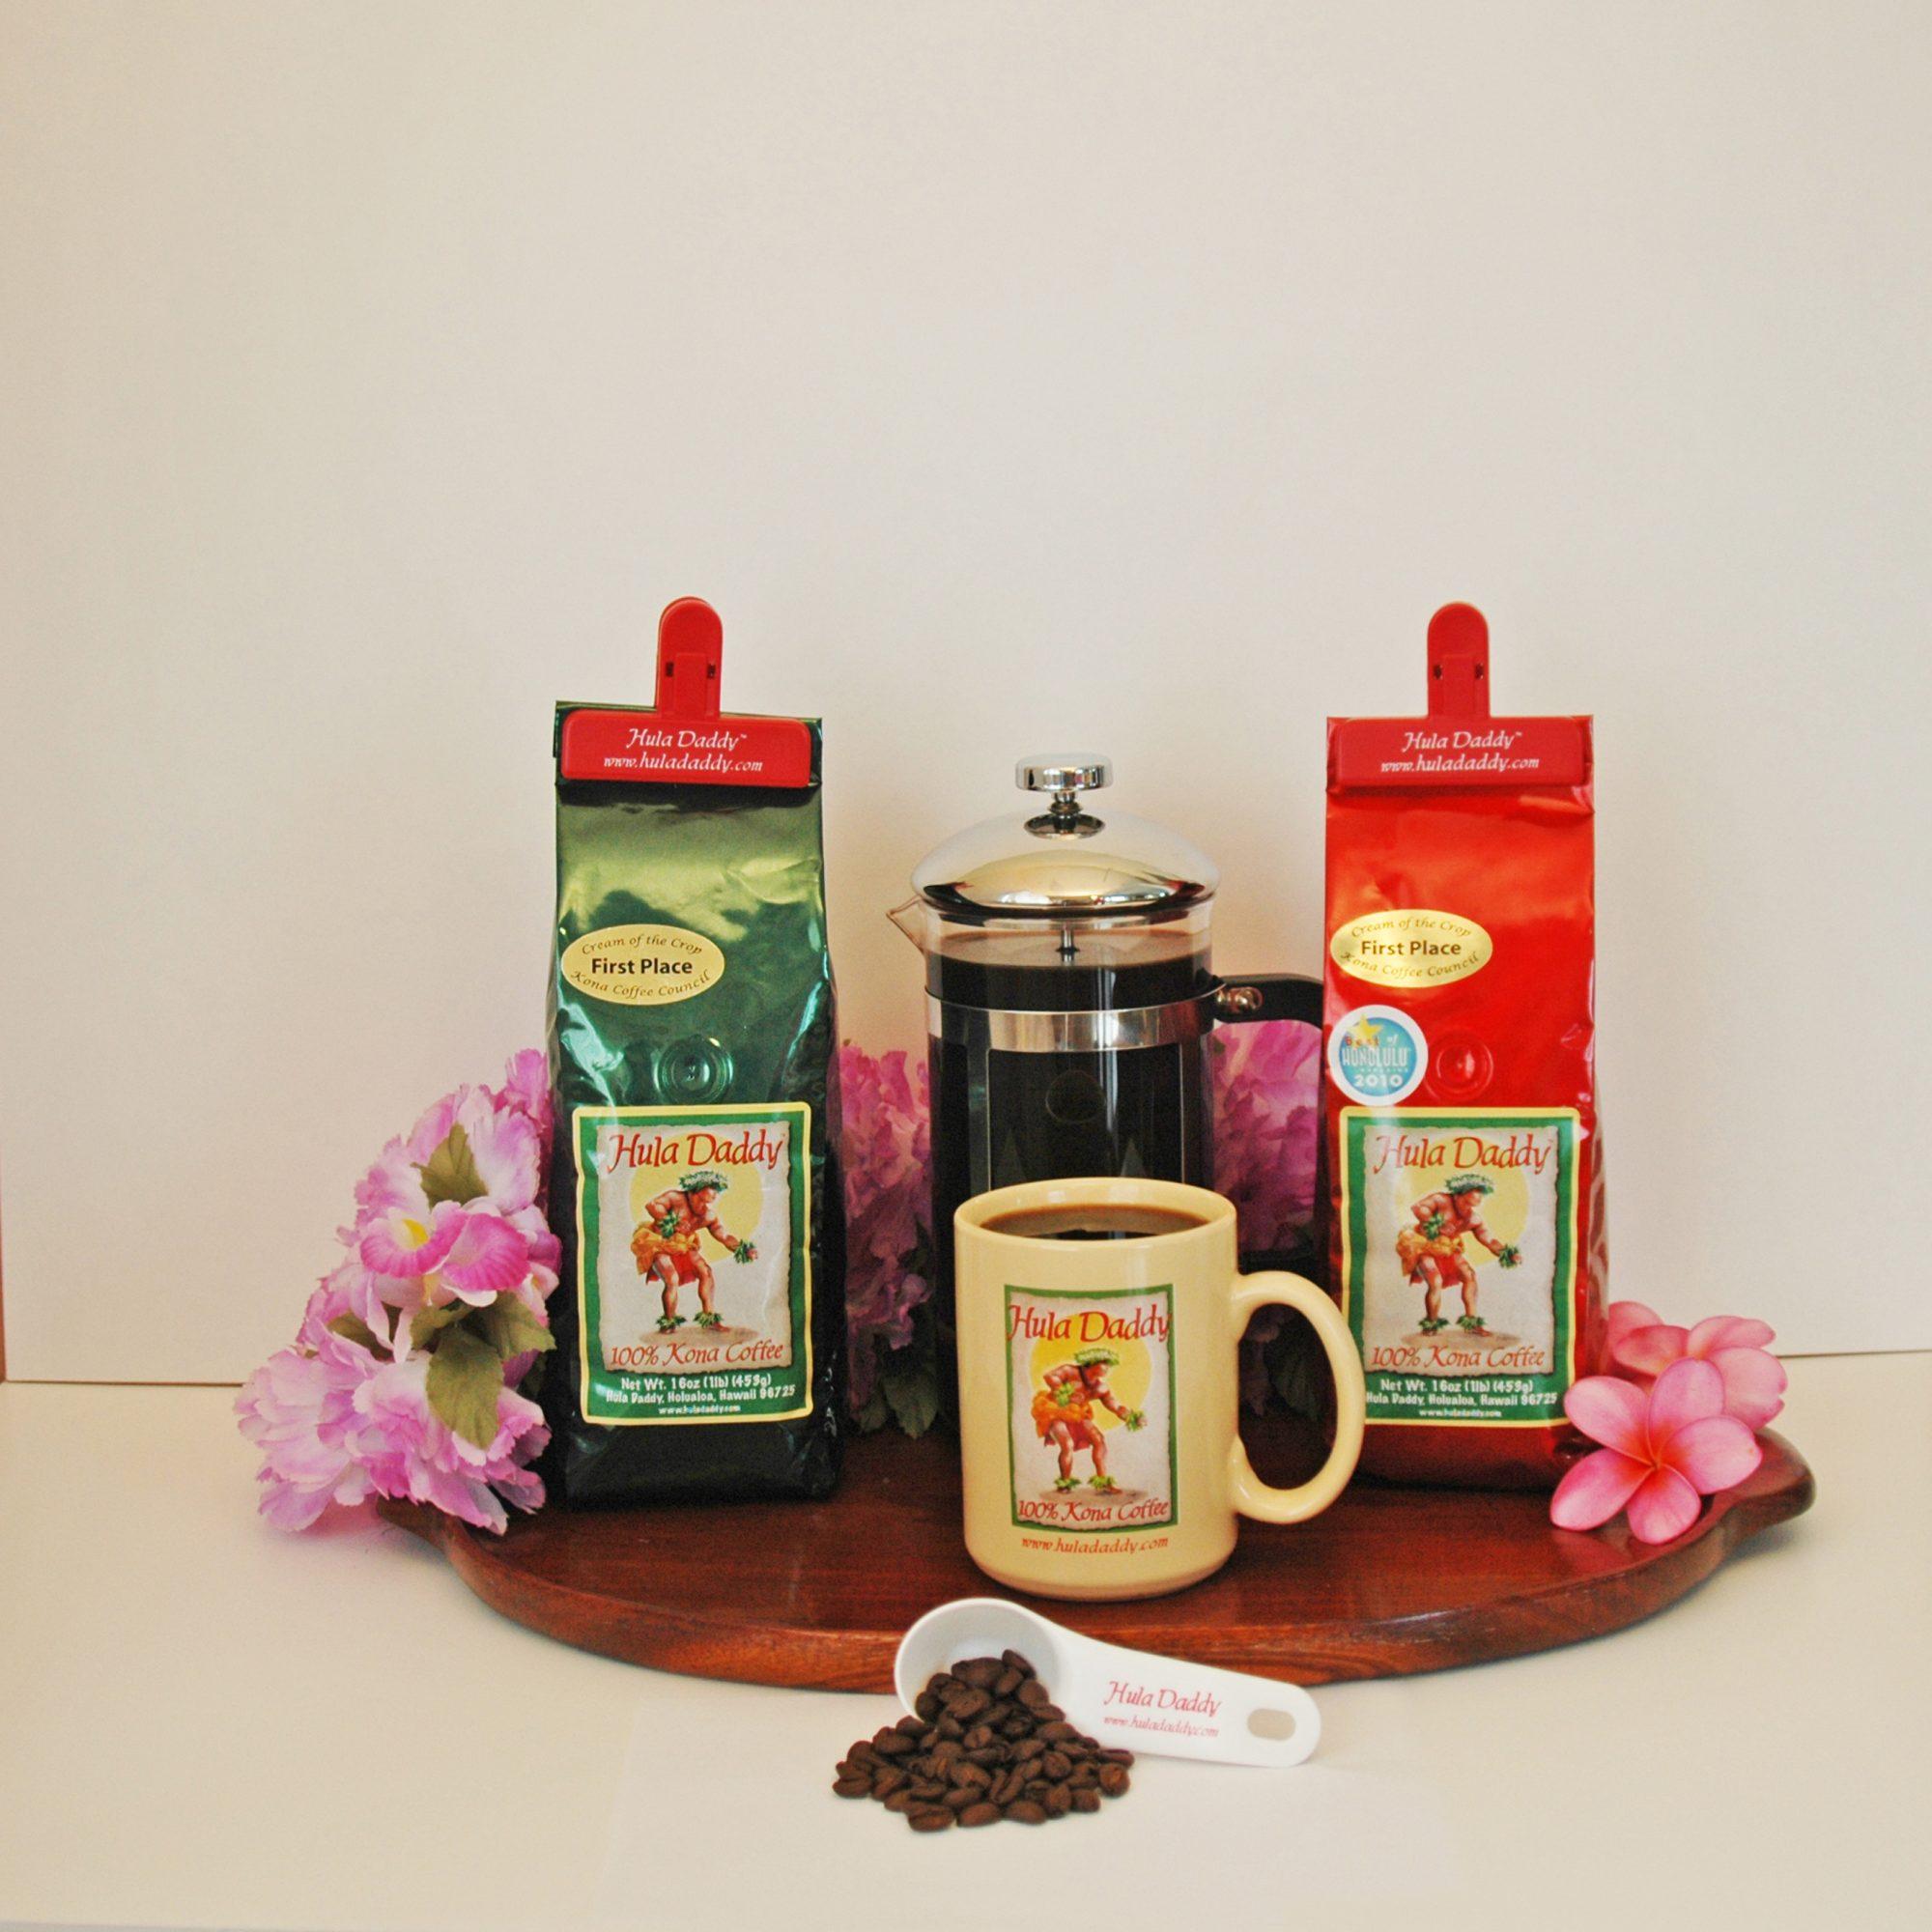 Coffee mug and packaged coffees